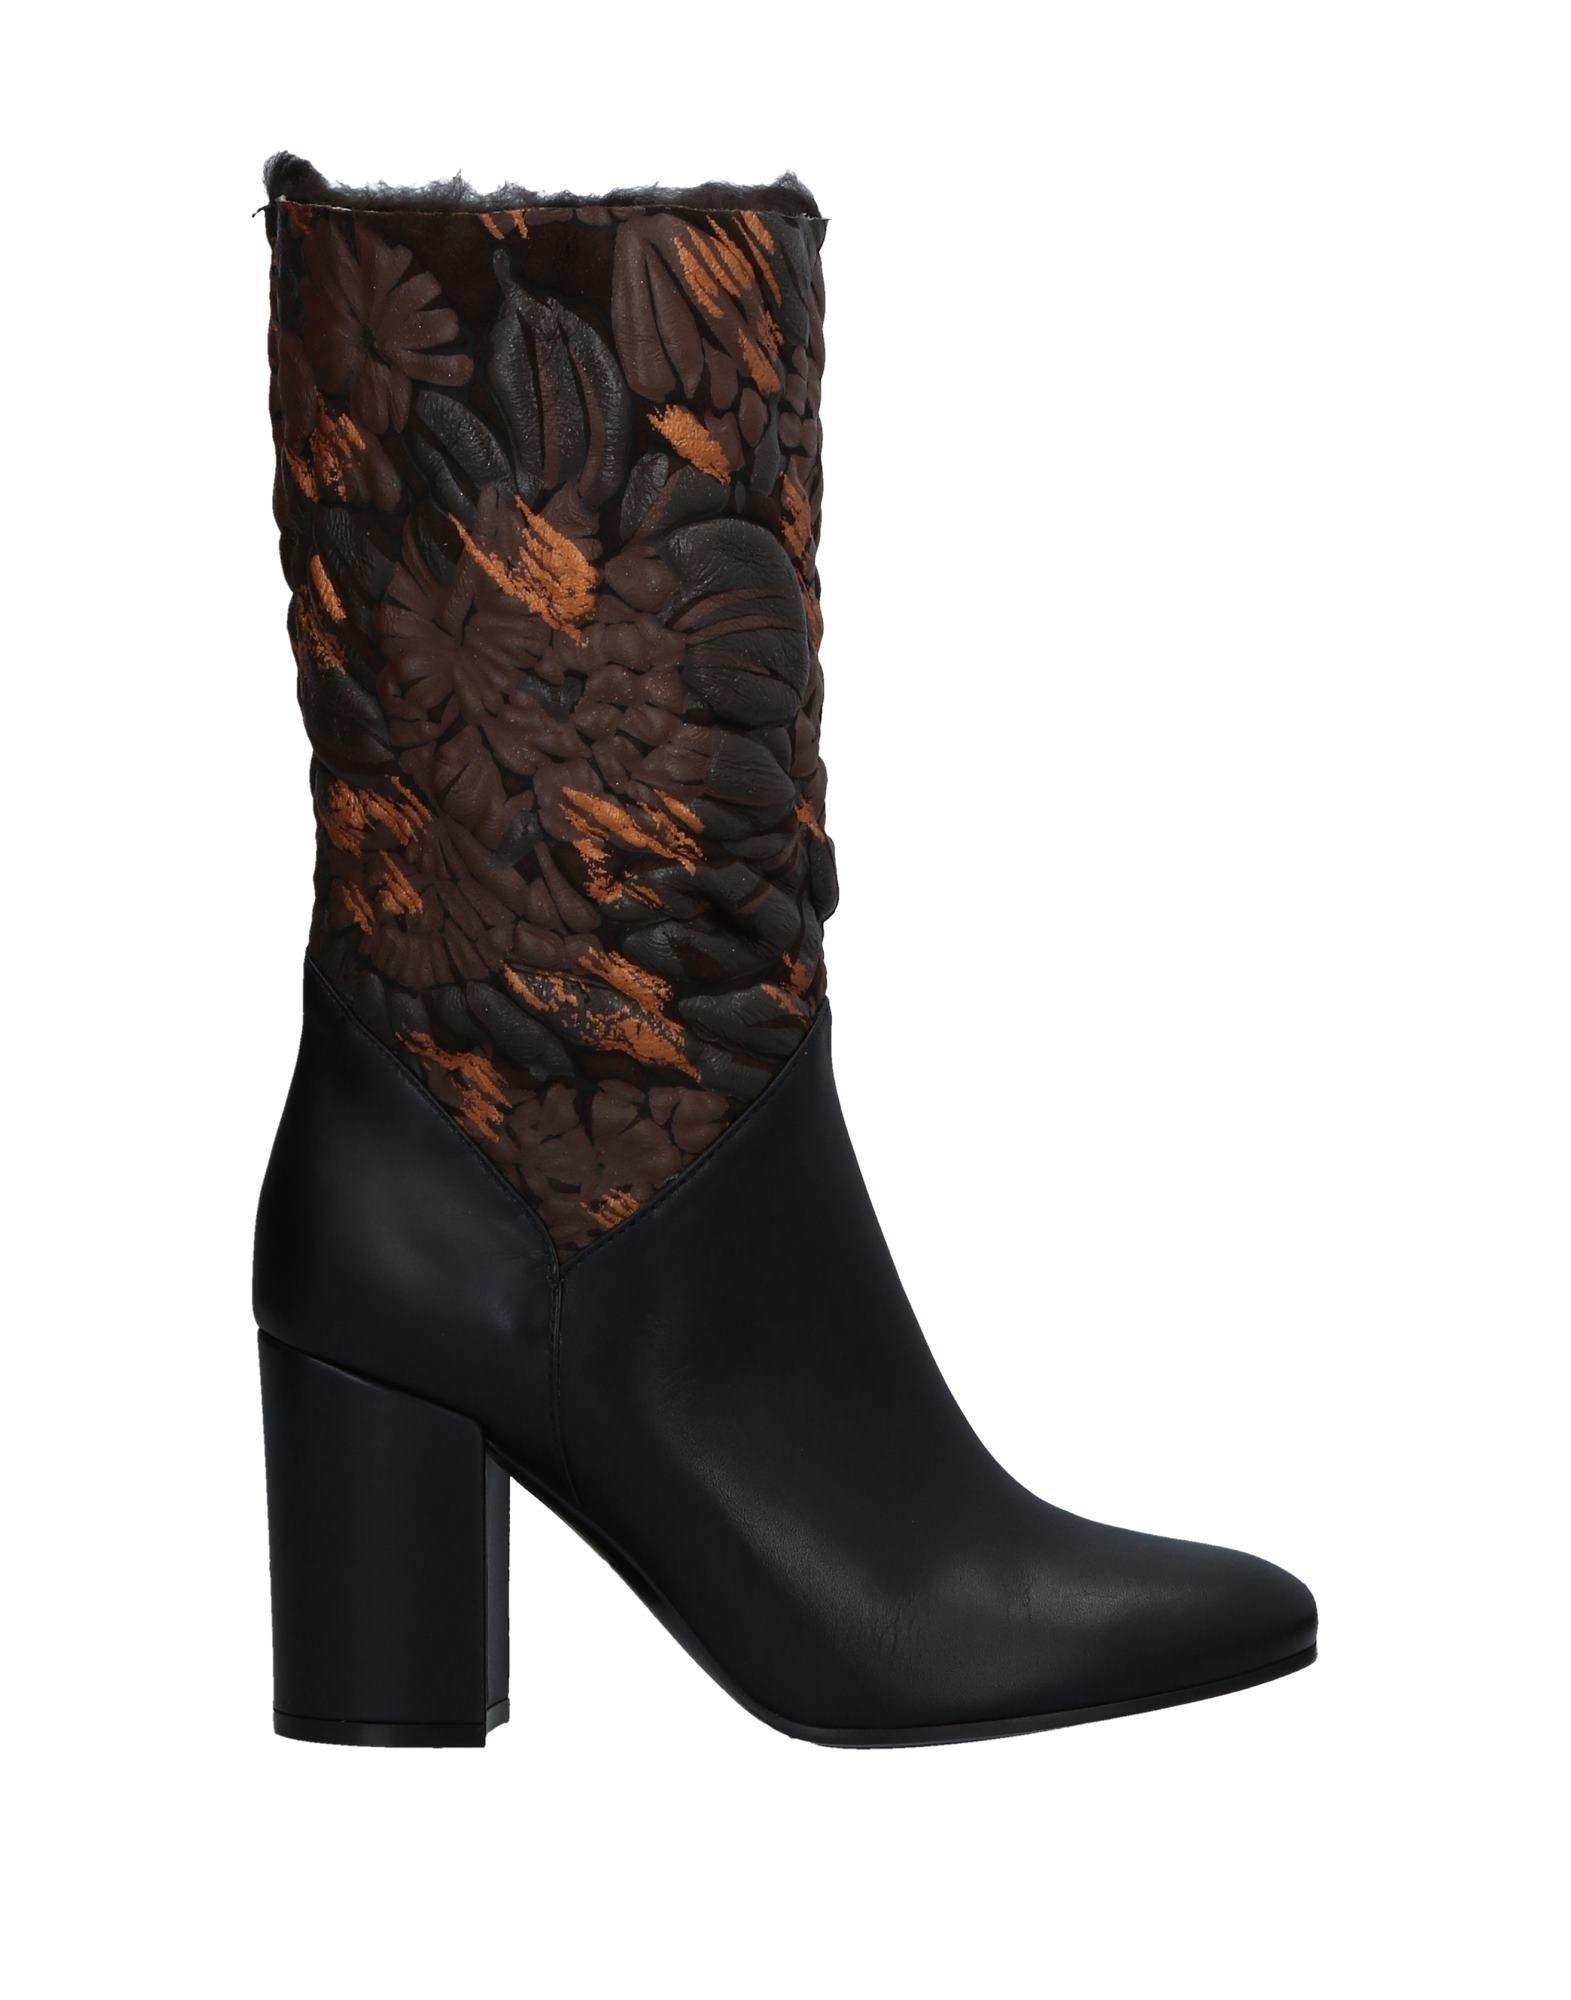 Lerre Ankle Ankle Ankle Boot - Women Lerre Ankle Boots online on  United Kingdom - 11515439CM 8e3373